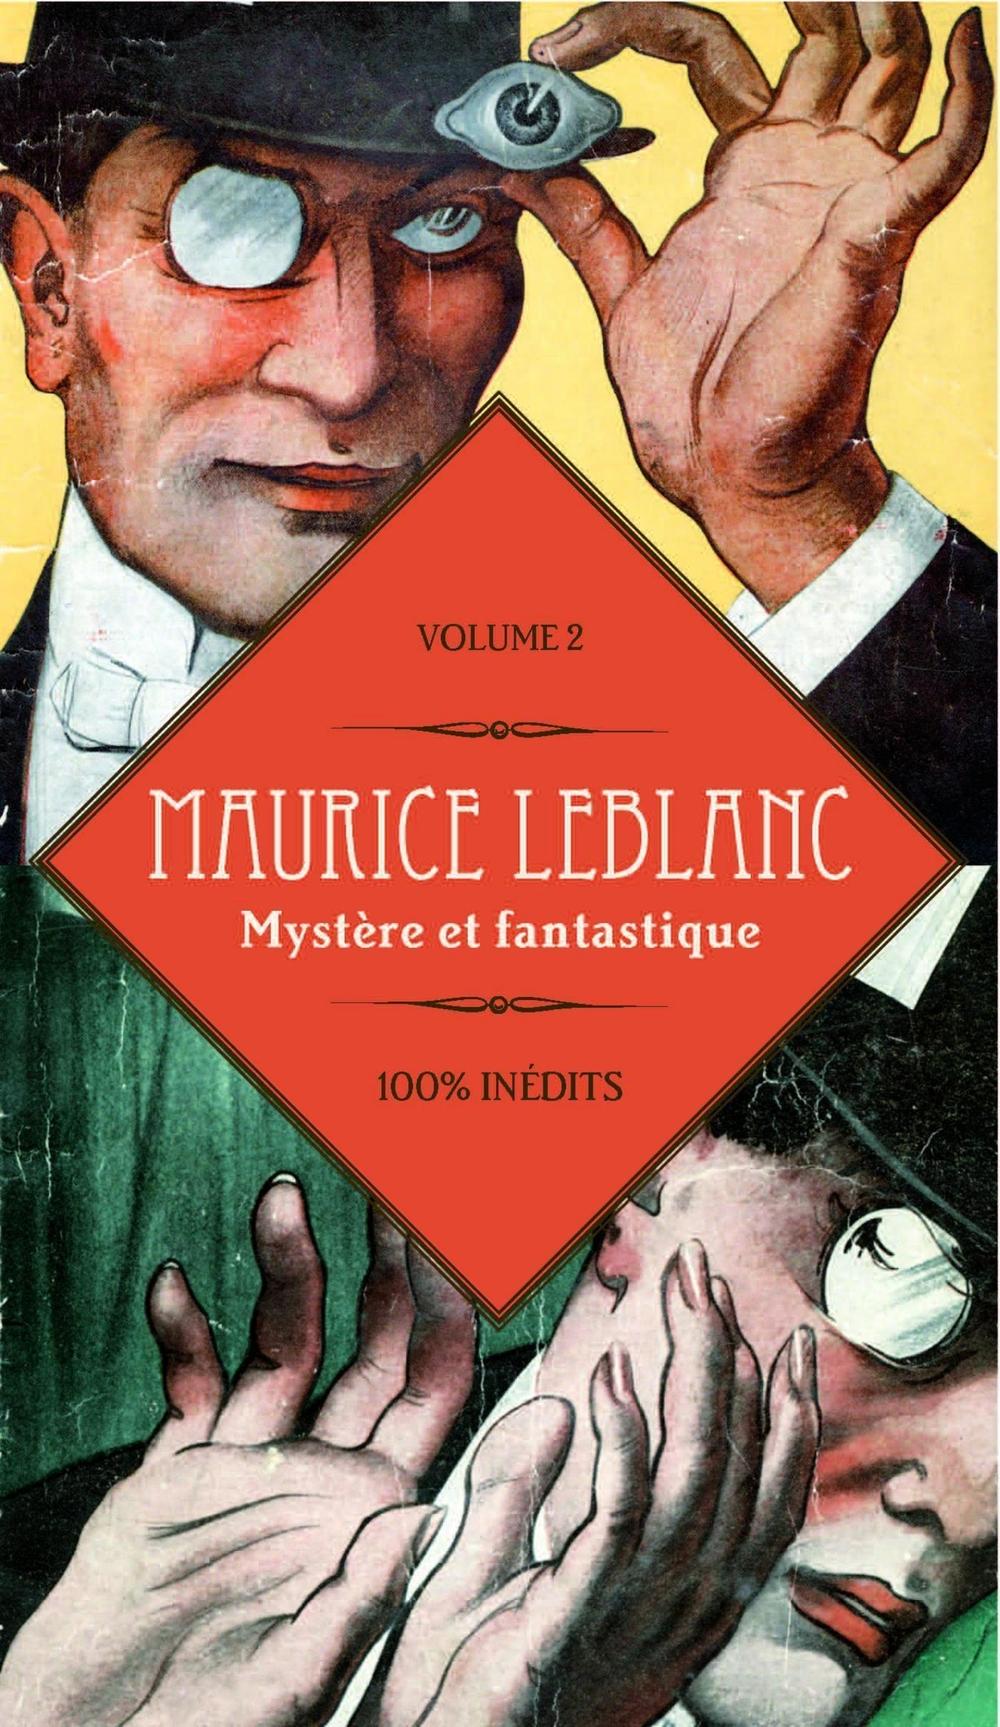 Maurice Leblanc 100% inédits : Mystère et fantasti